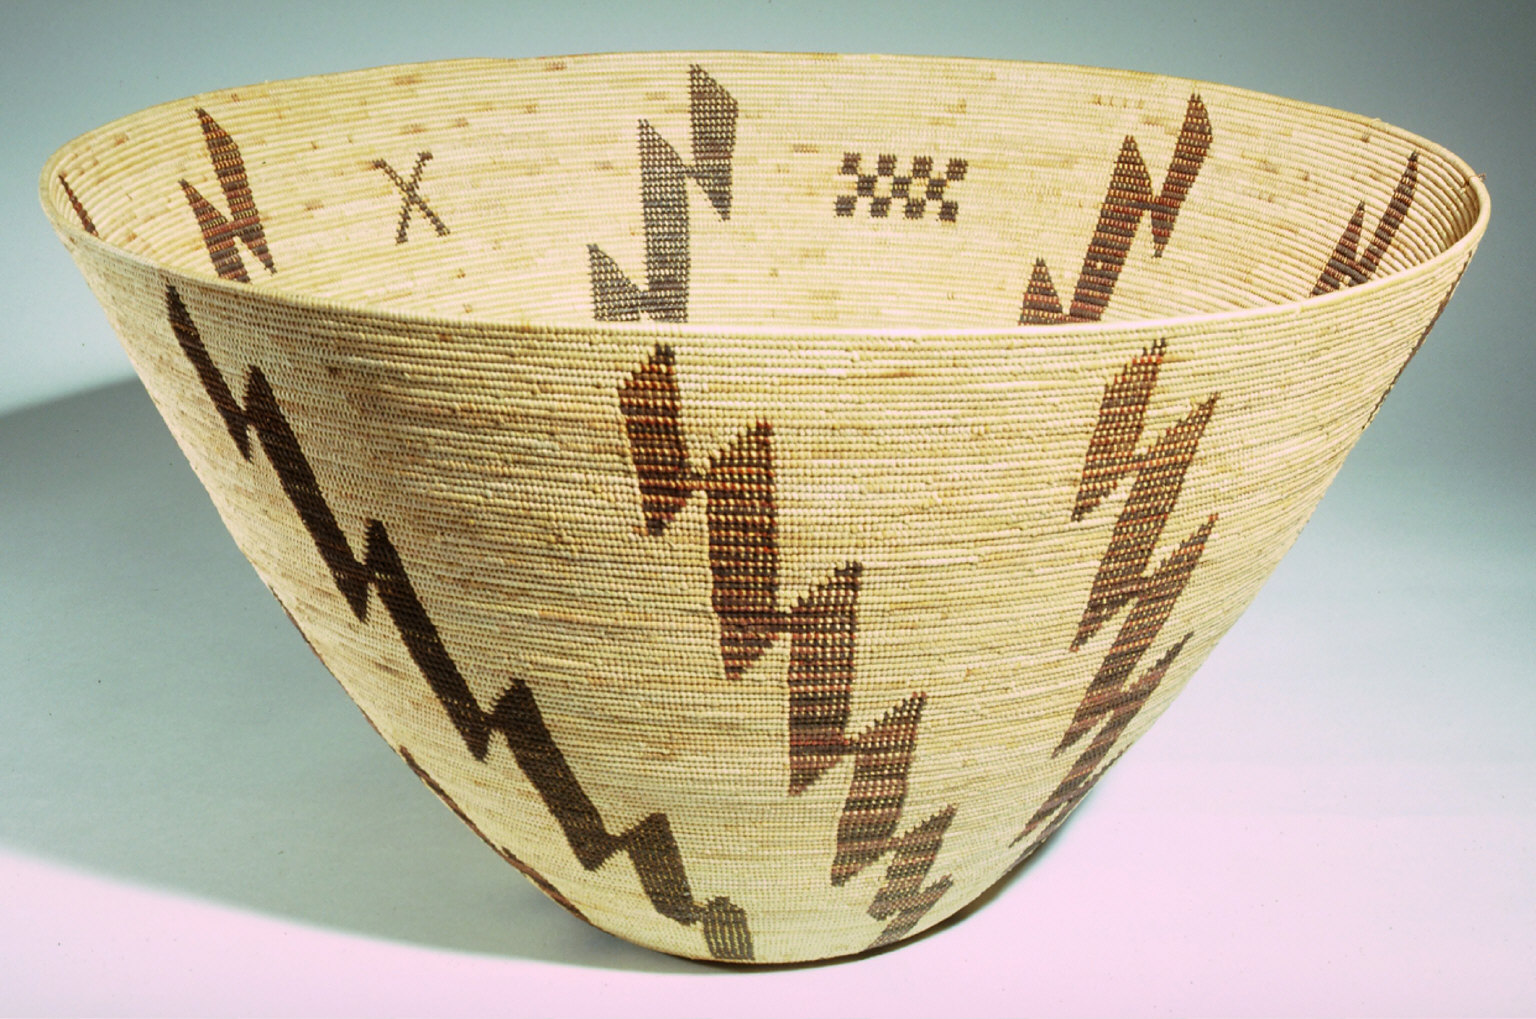 Twined storage basket